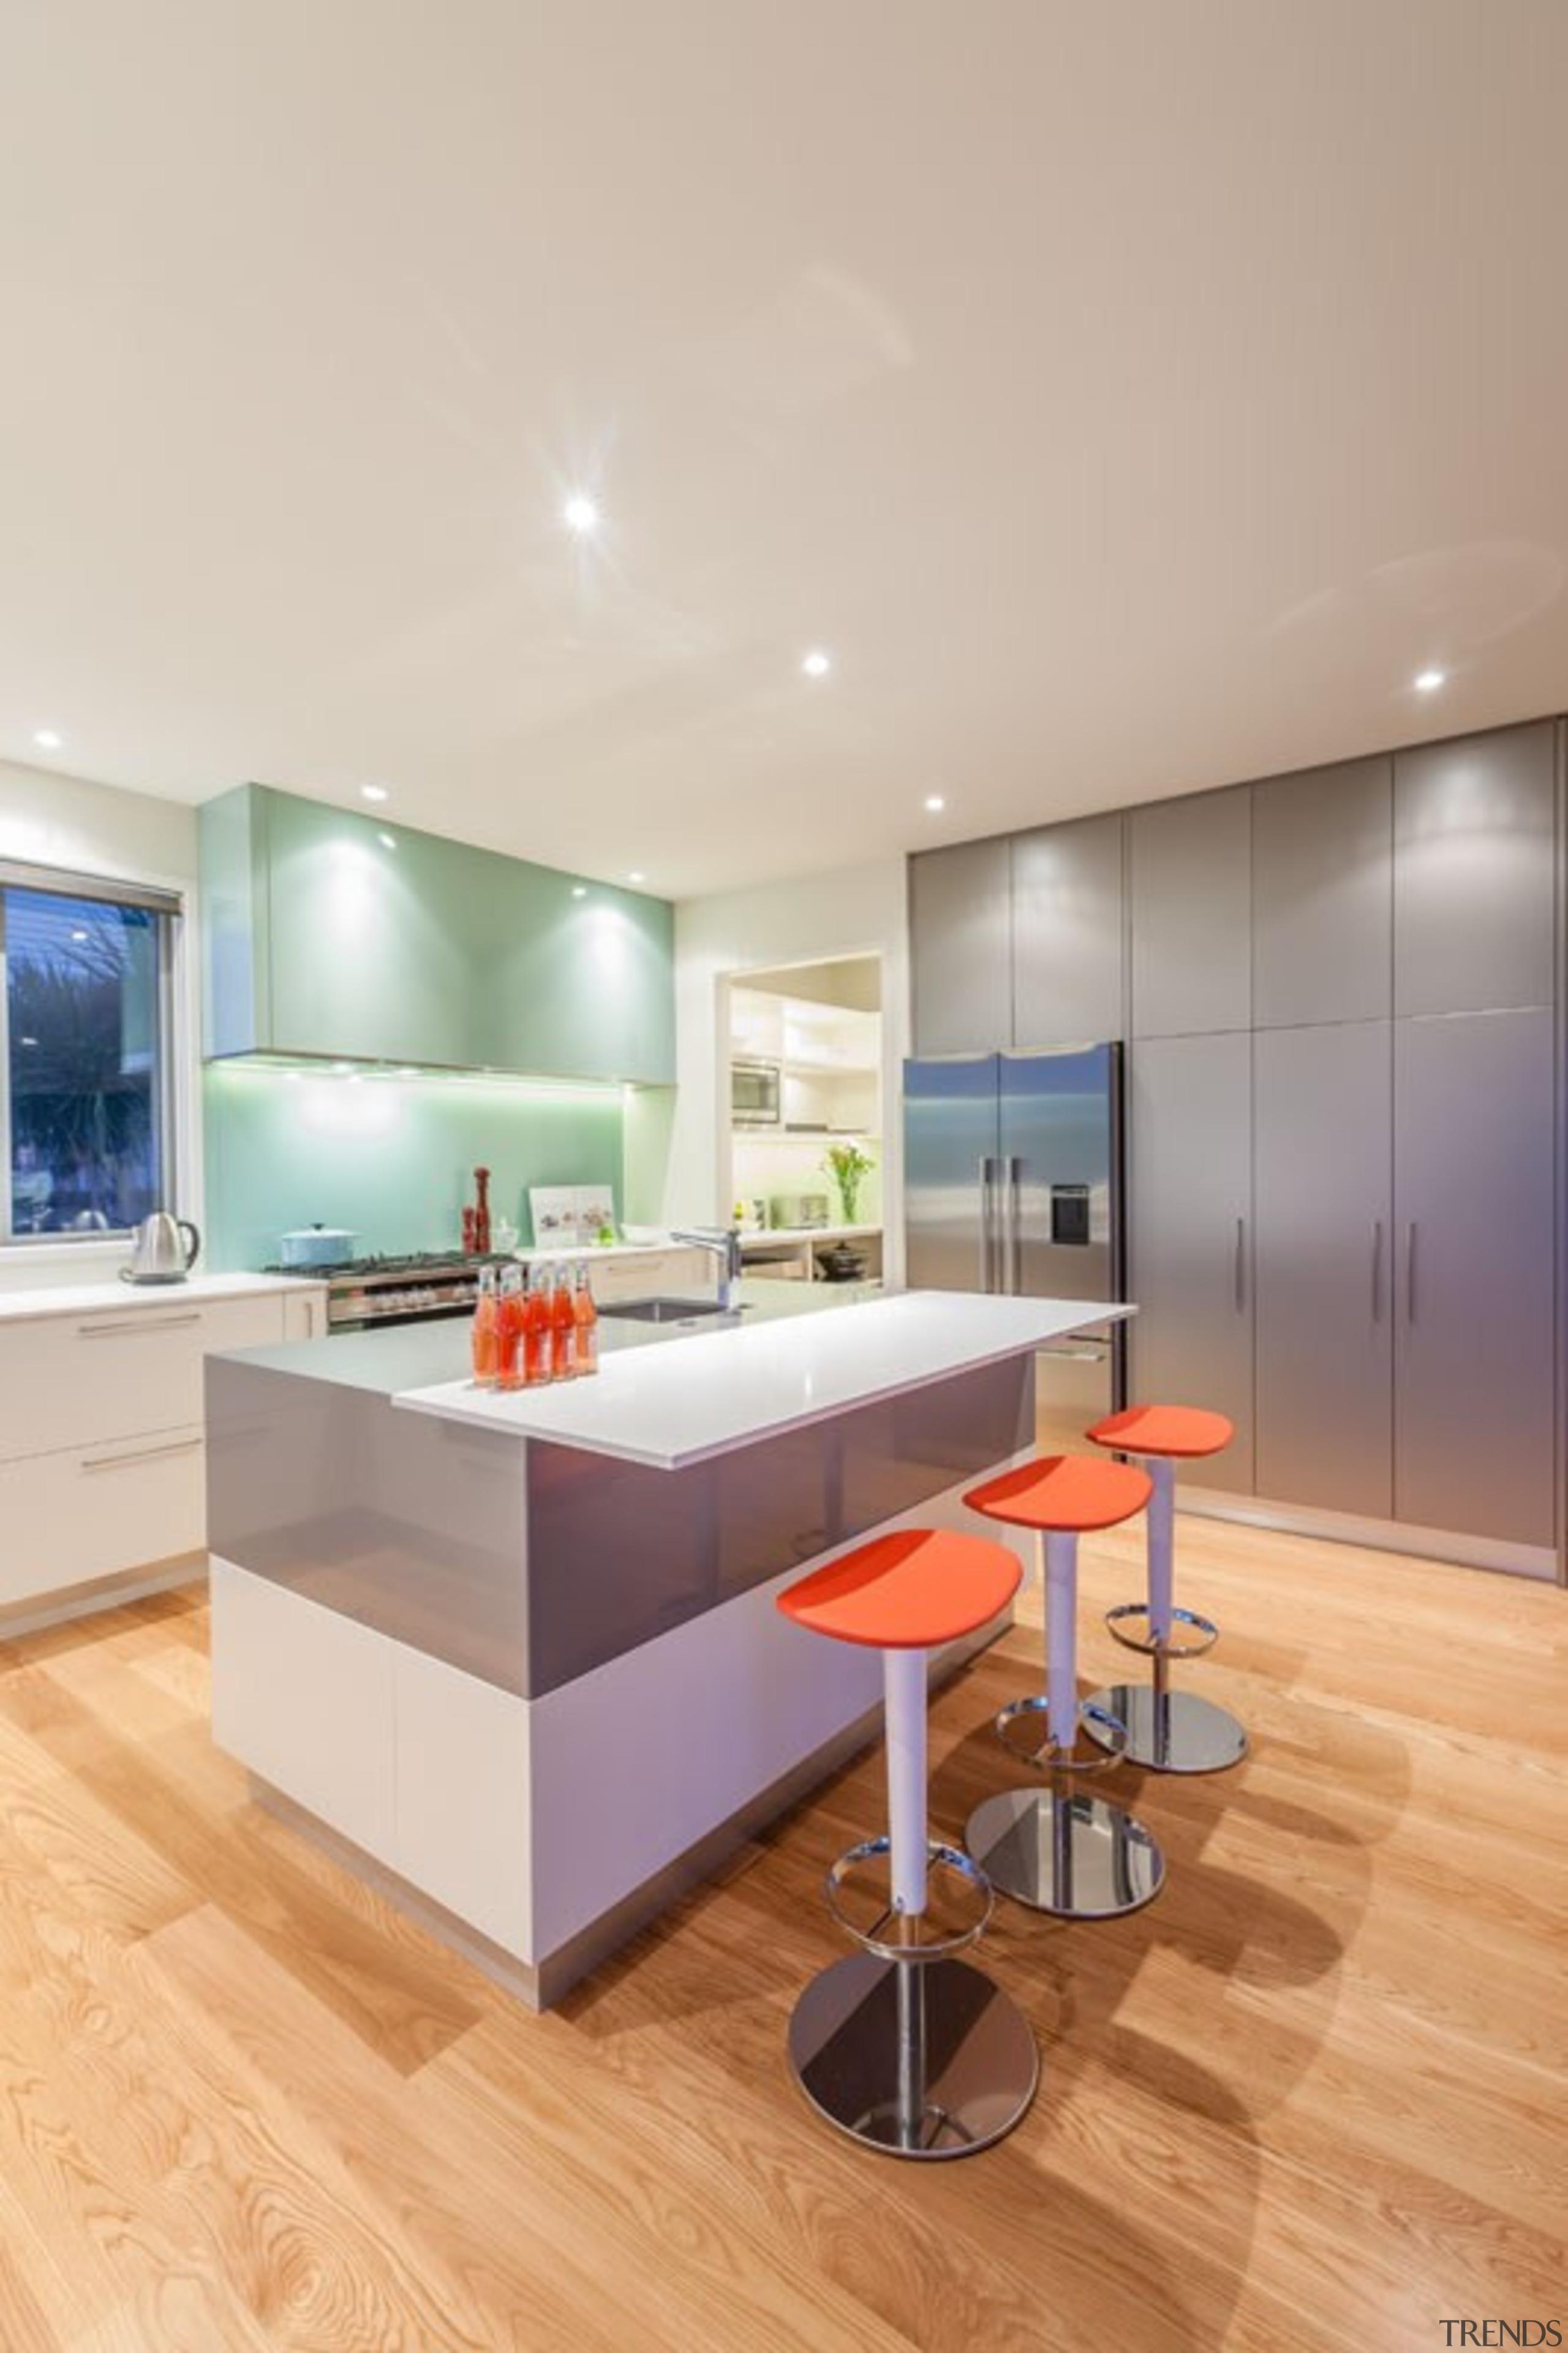 Tropical Kitchen - Tropical Kitchen - architecture   architecture, ceiling, countertop, floor, hardwood, interior design, kitchen, real estate, room, wood flooring, gray